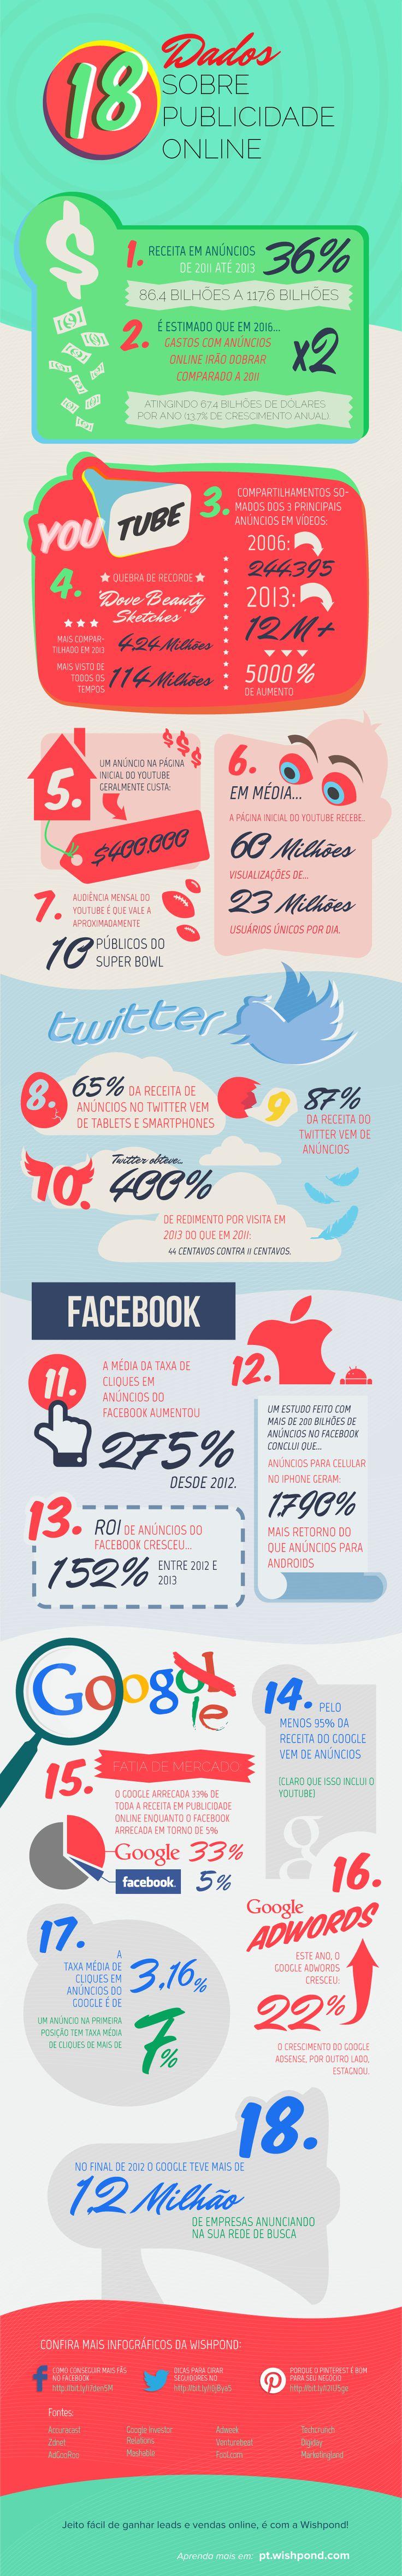 18 dados sobre a publicidade online